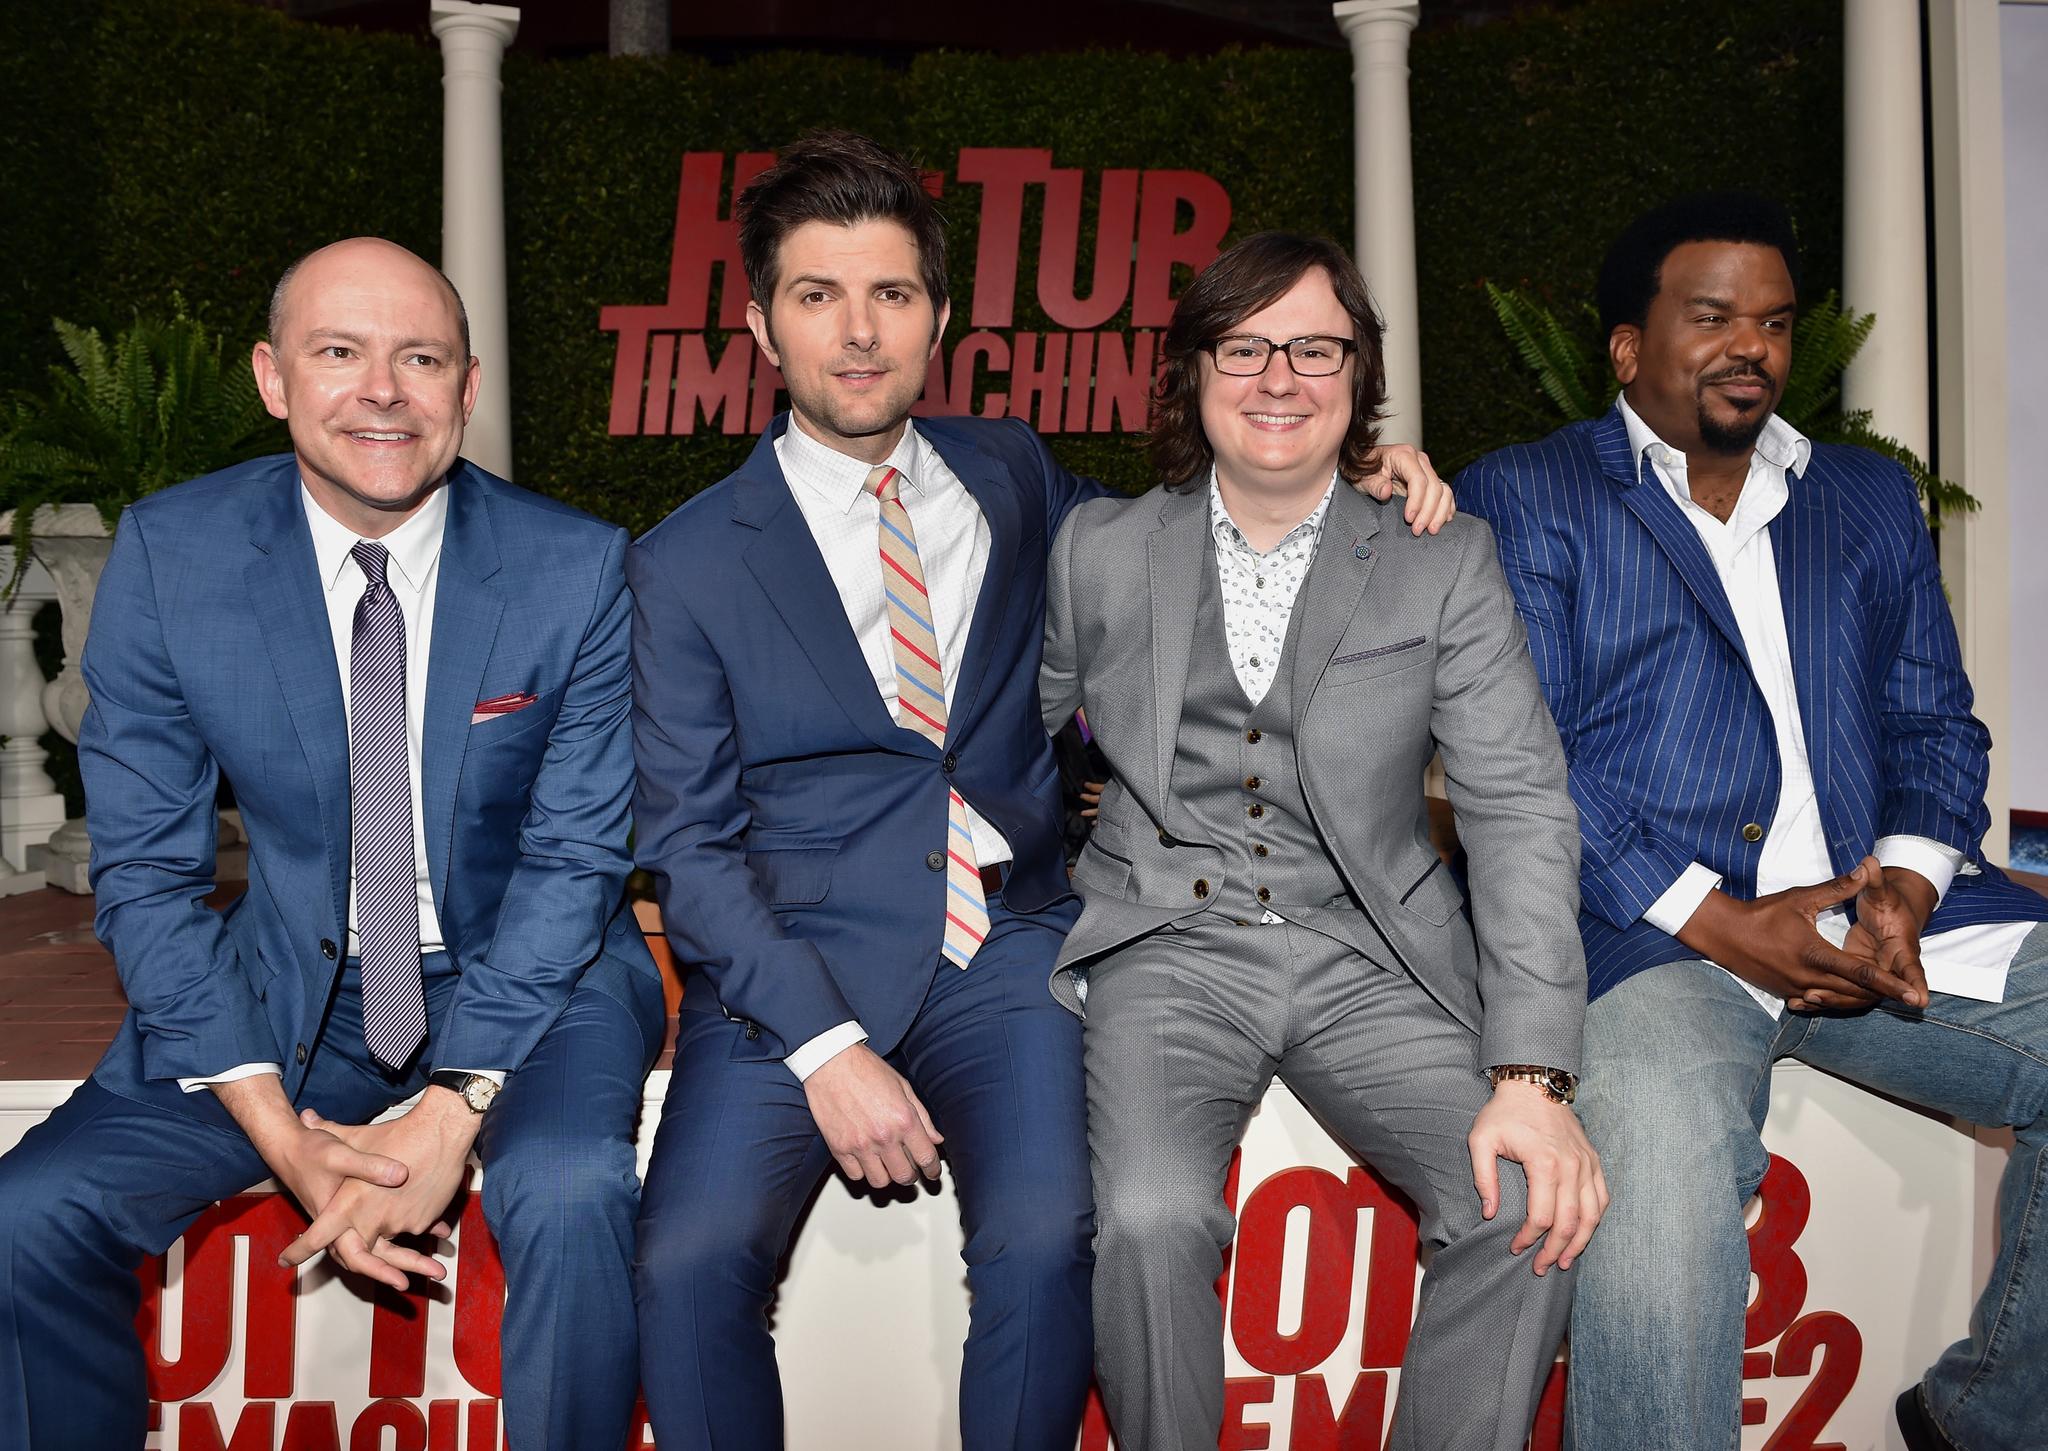 Adam Scott, Clark Duke, Craig Robinson, and Rob Corddry at an event for Hot Tub Time Machine 2 (2015)